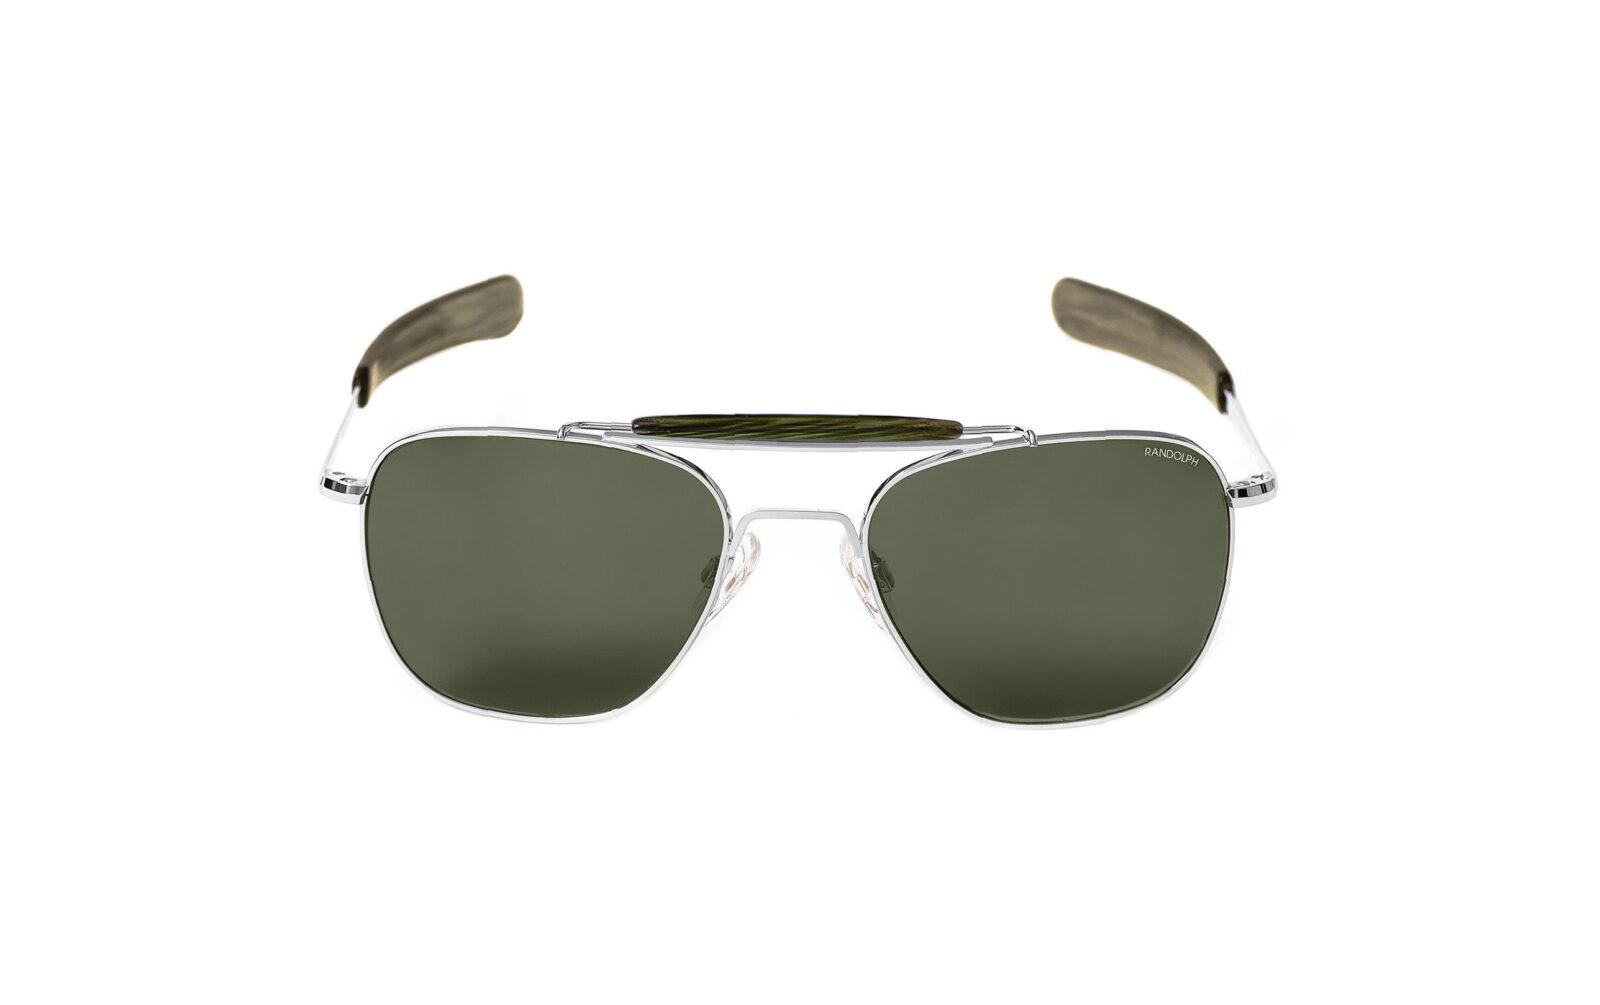 Randolph Aviator II Sunglasses 1600x1005 - Randolph Aviator II Sunglasses